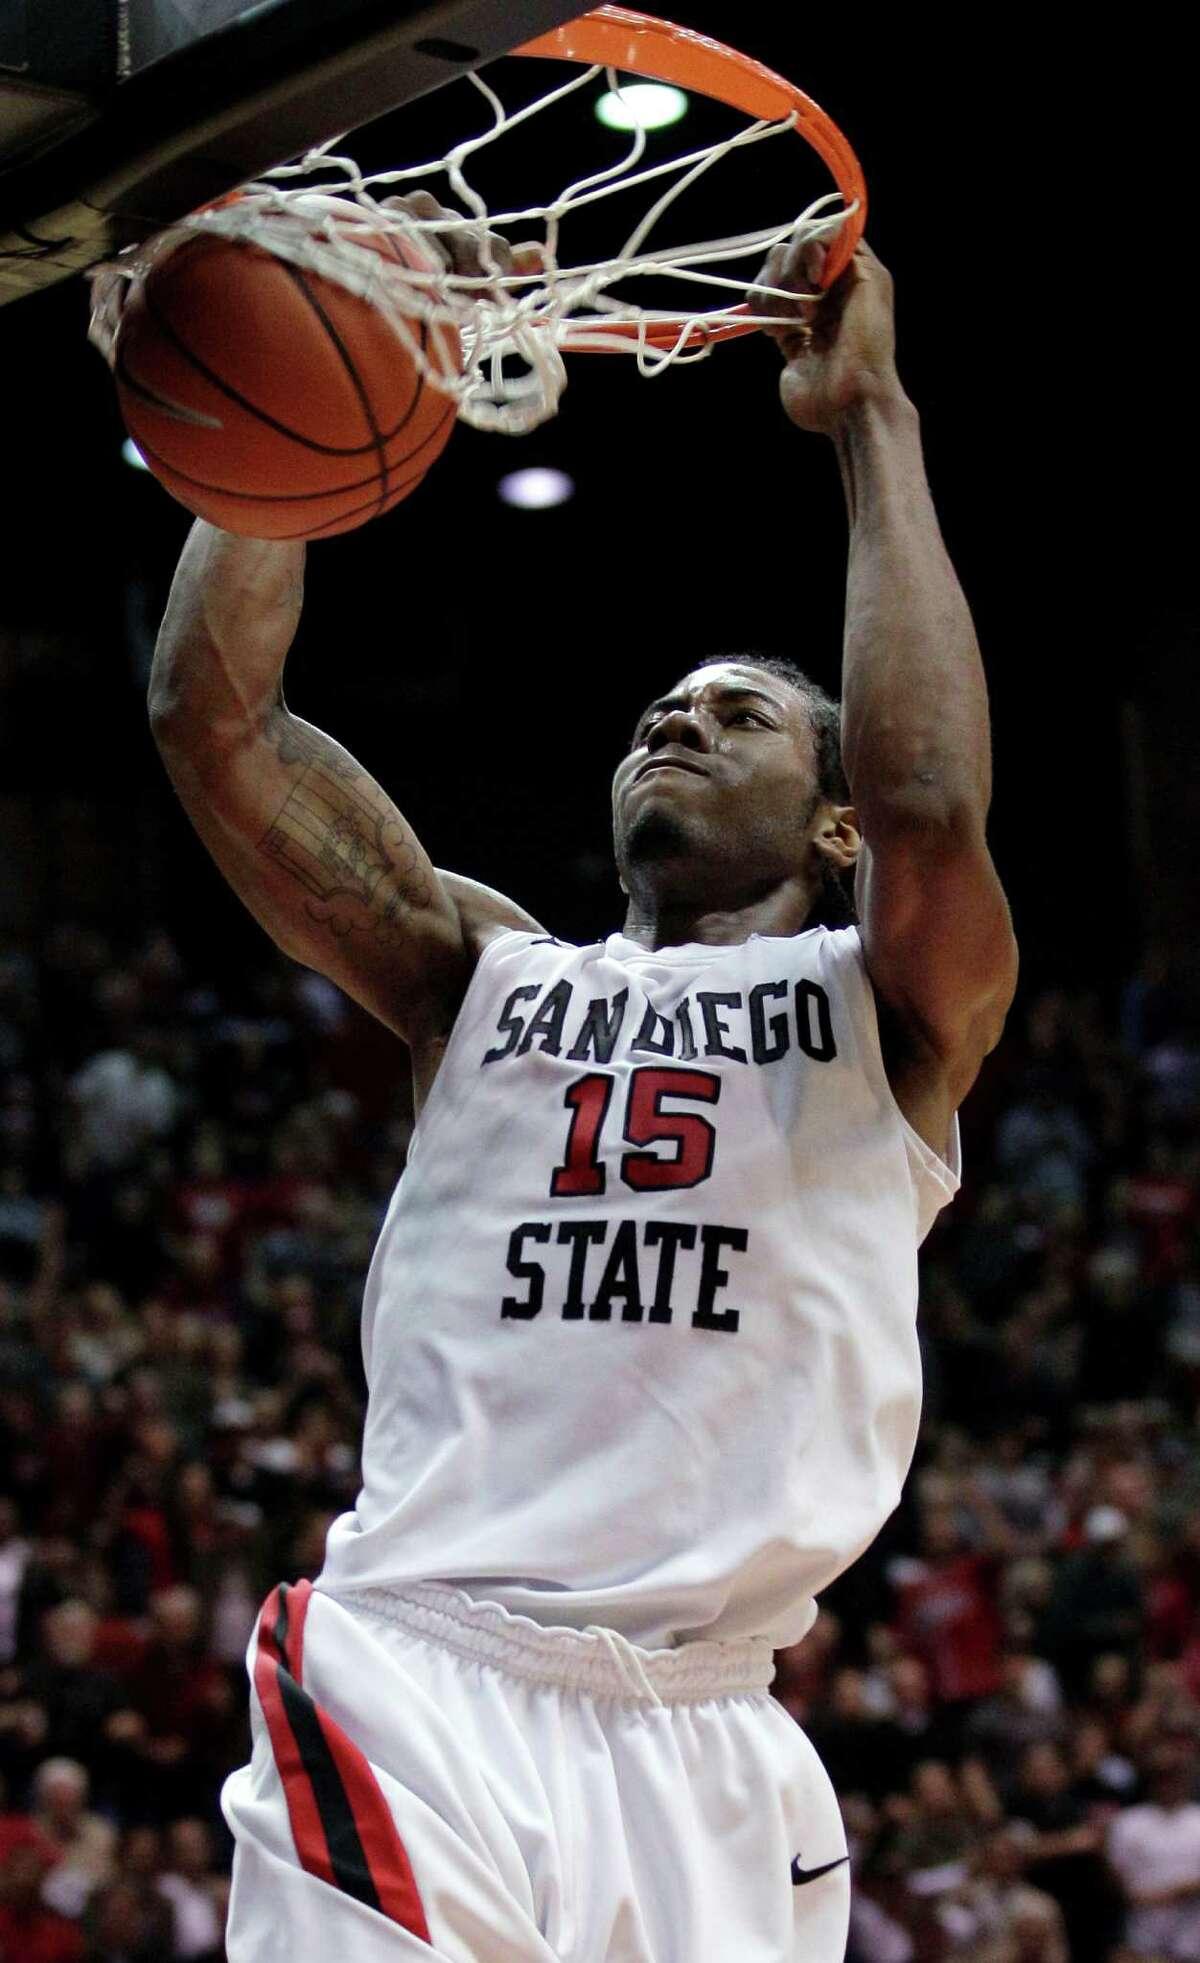 Kawhi Leonard: San Diego State (2009-2011)